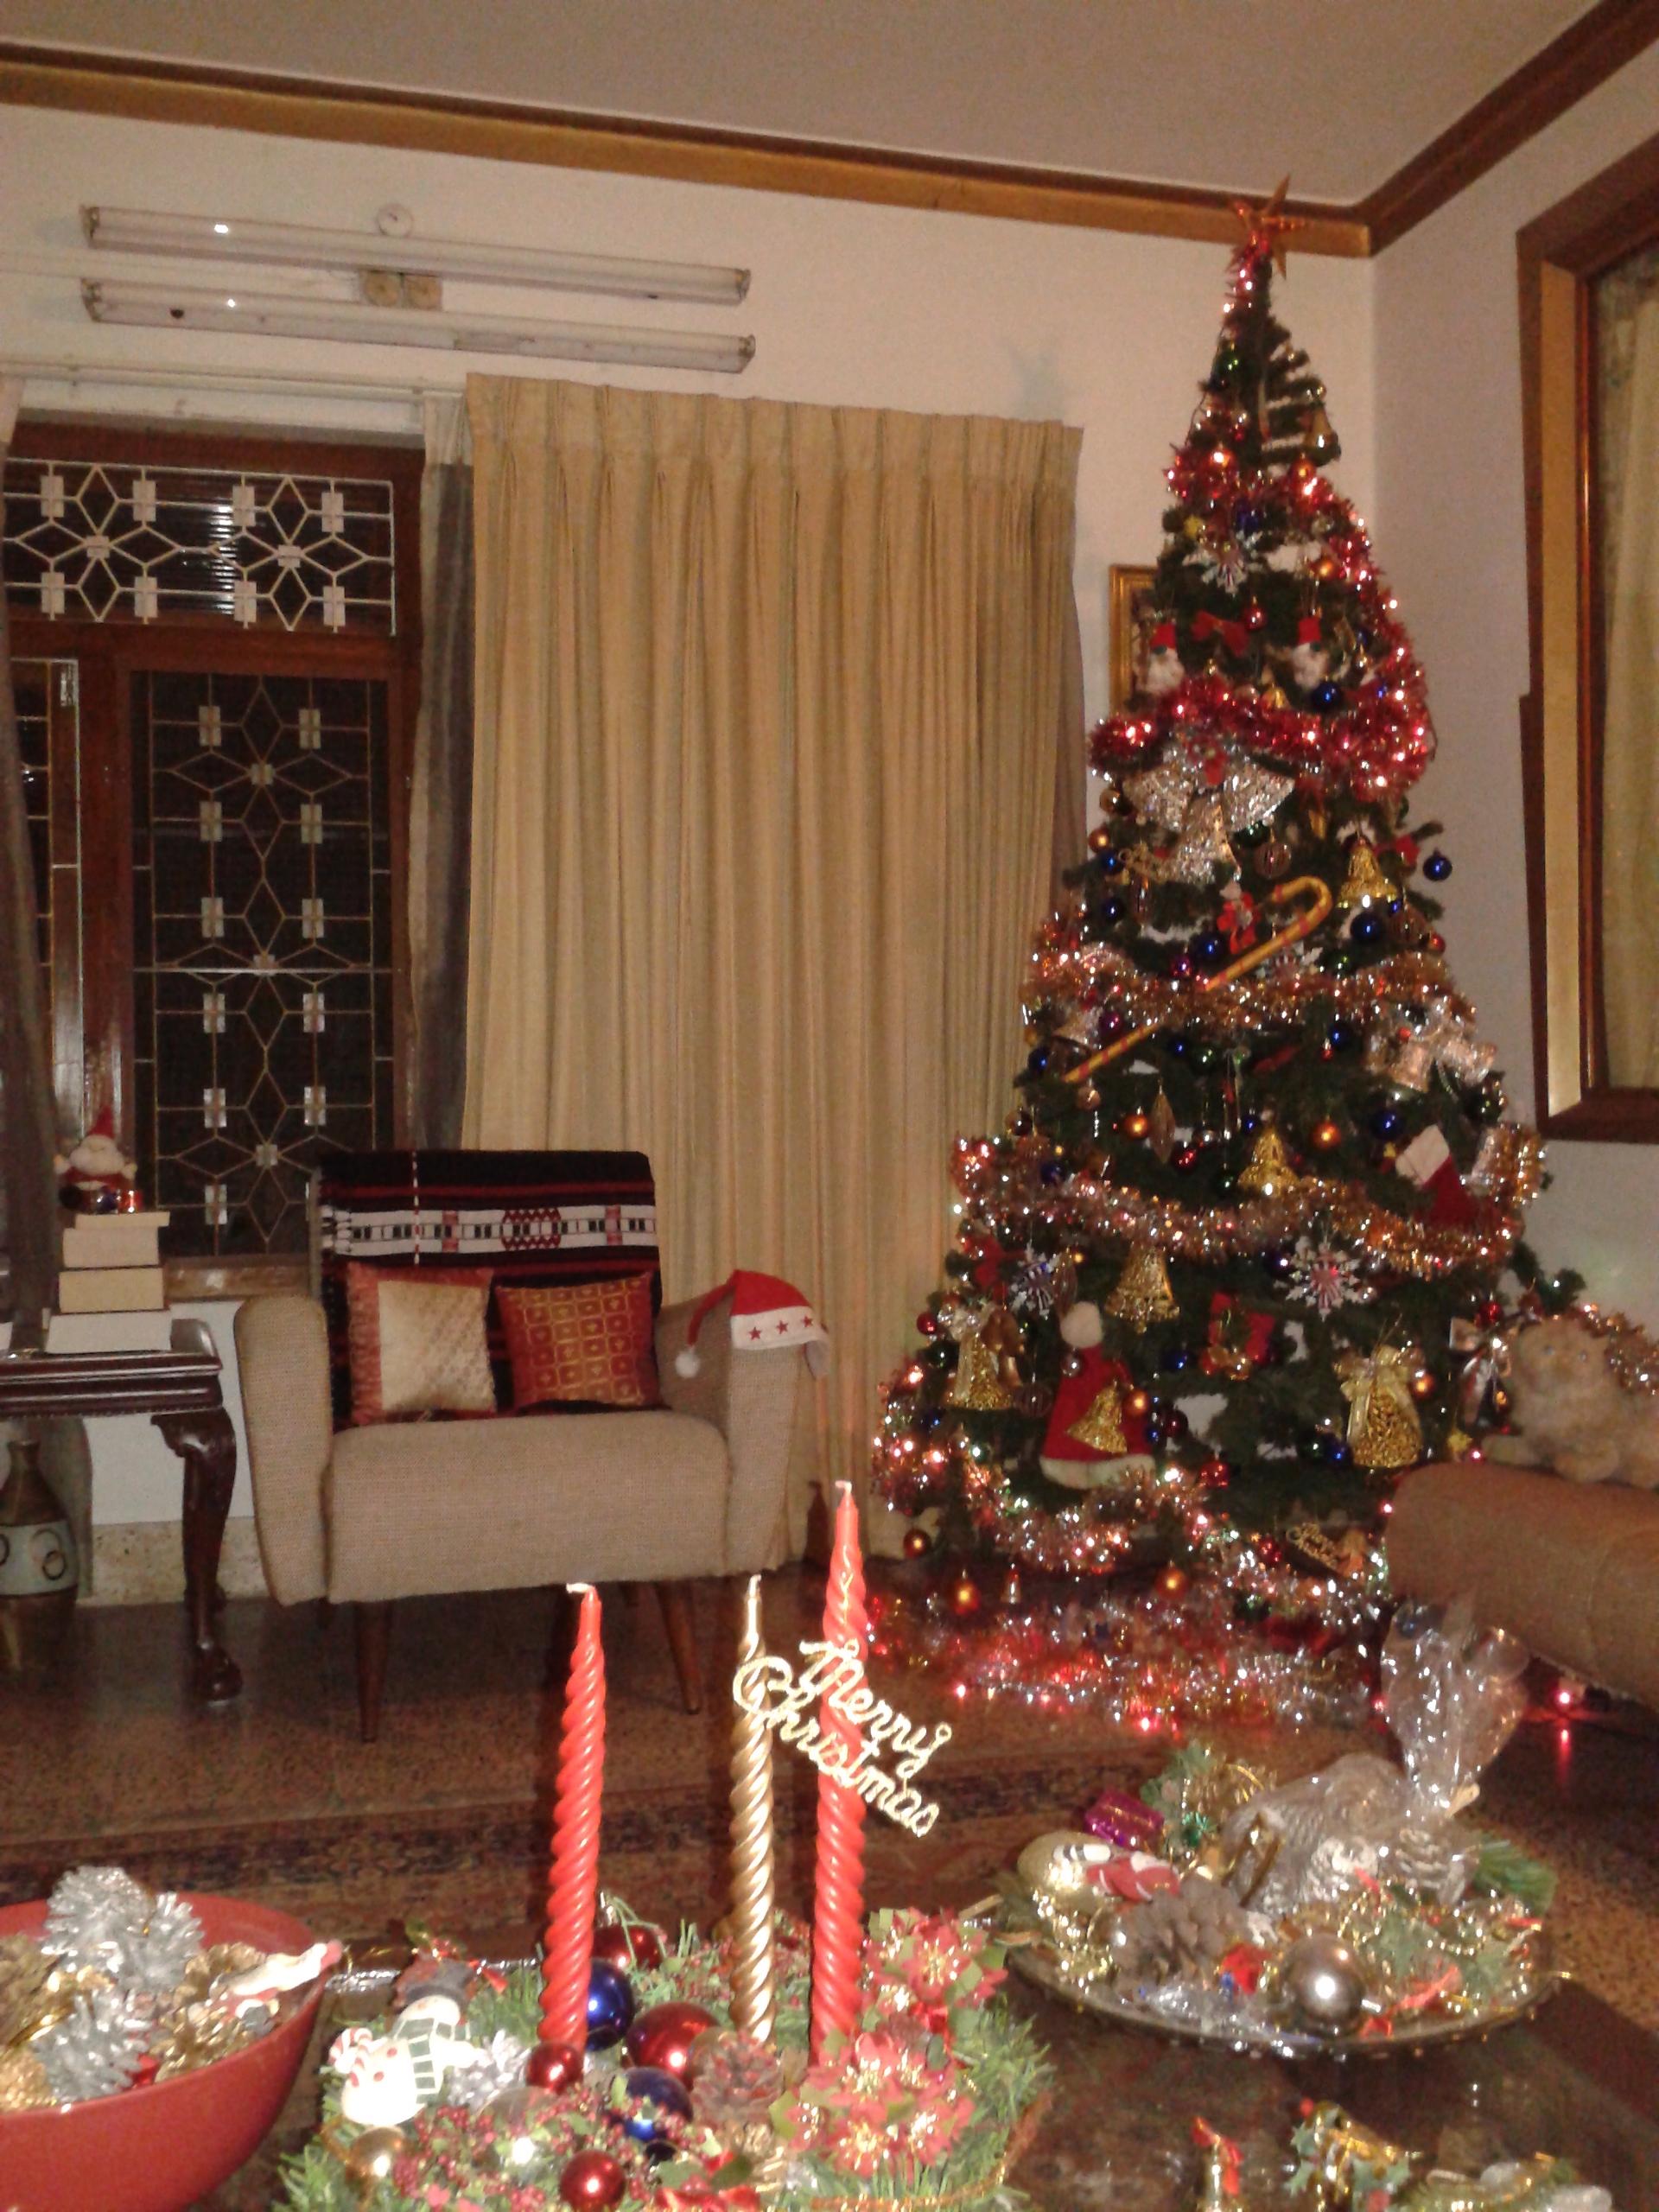 FileChristmas Tree In A Home Kerala Indiajpg